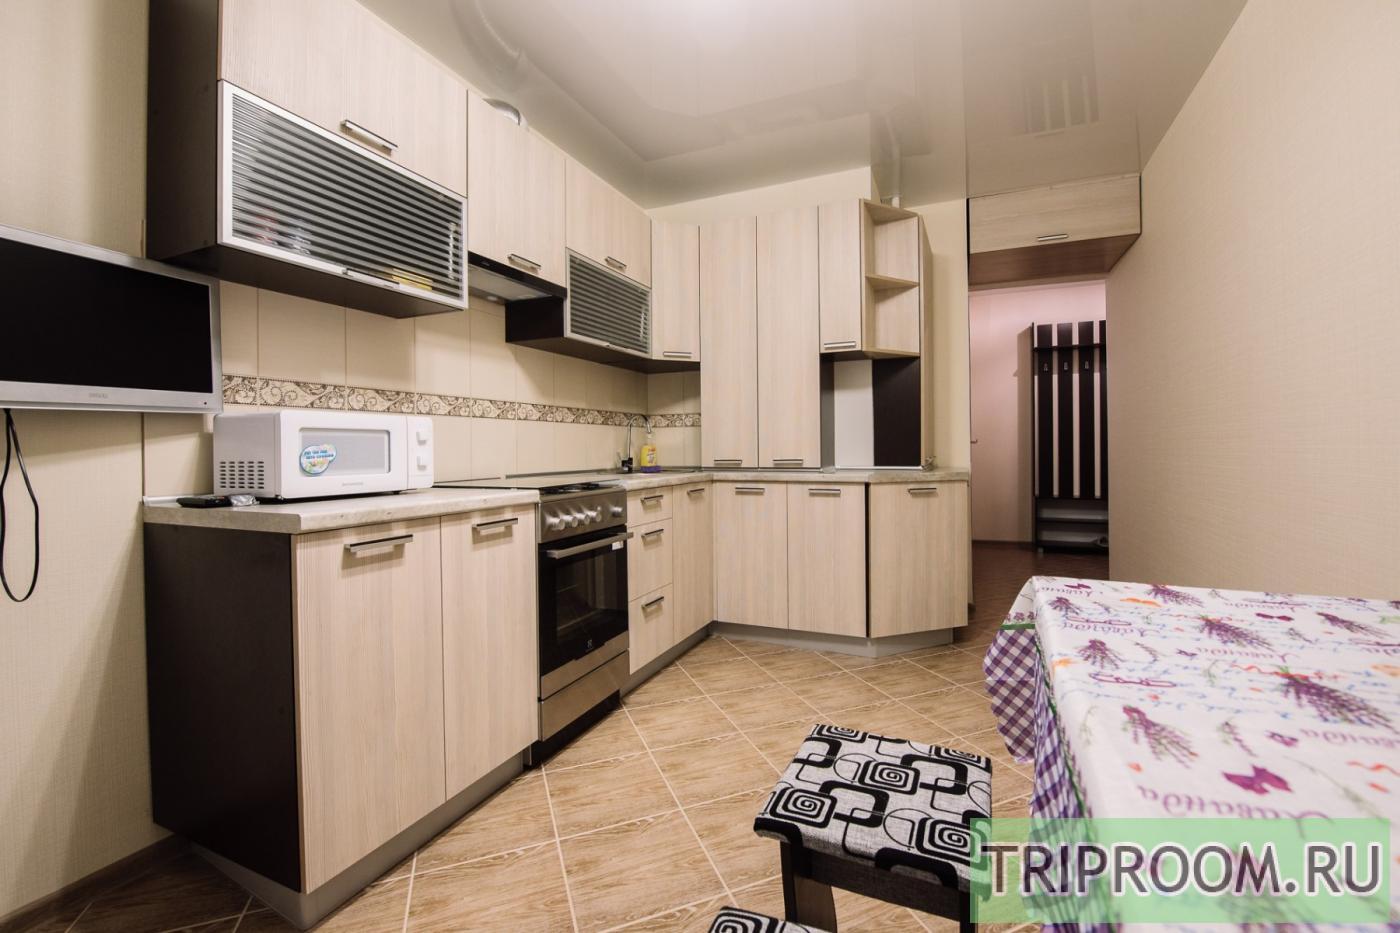 1-комнатная квартира посуточно (вариант № 21616), ул. Нормандия-Неман, фото № 9